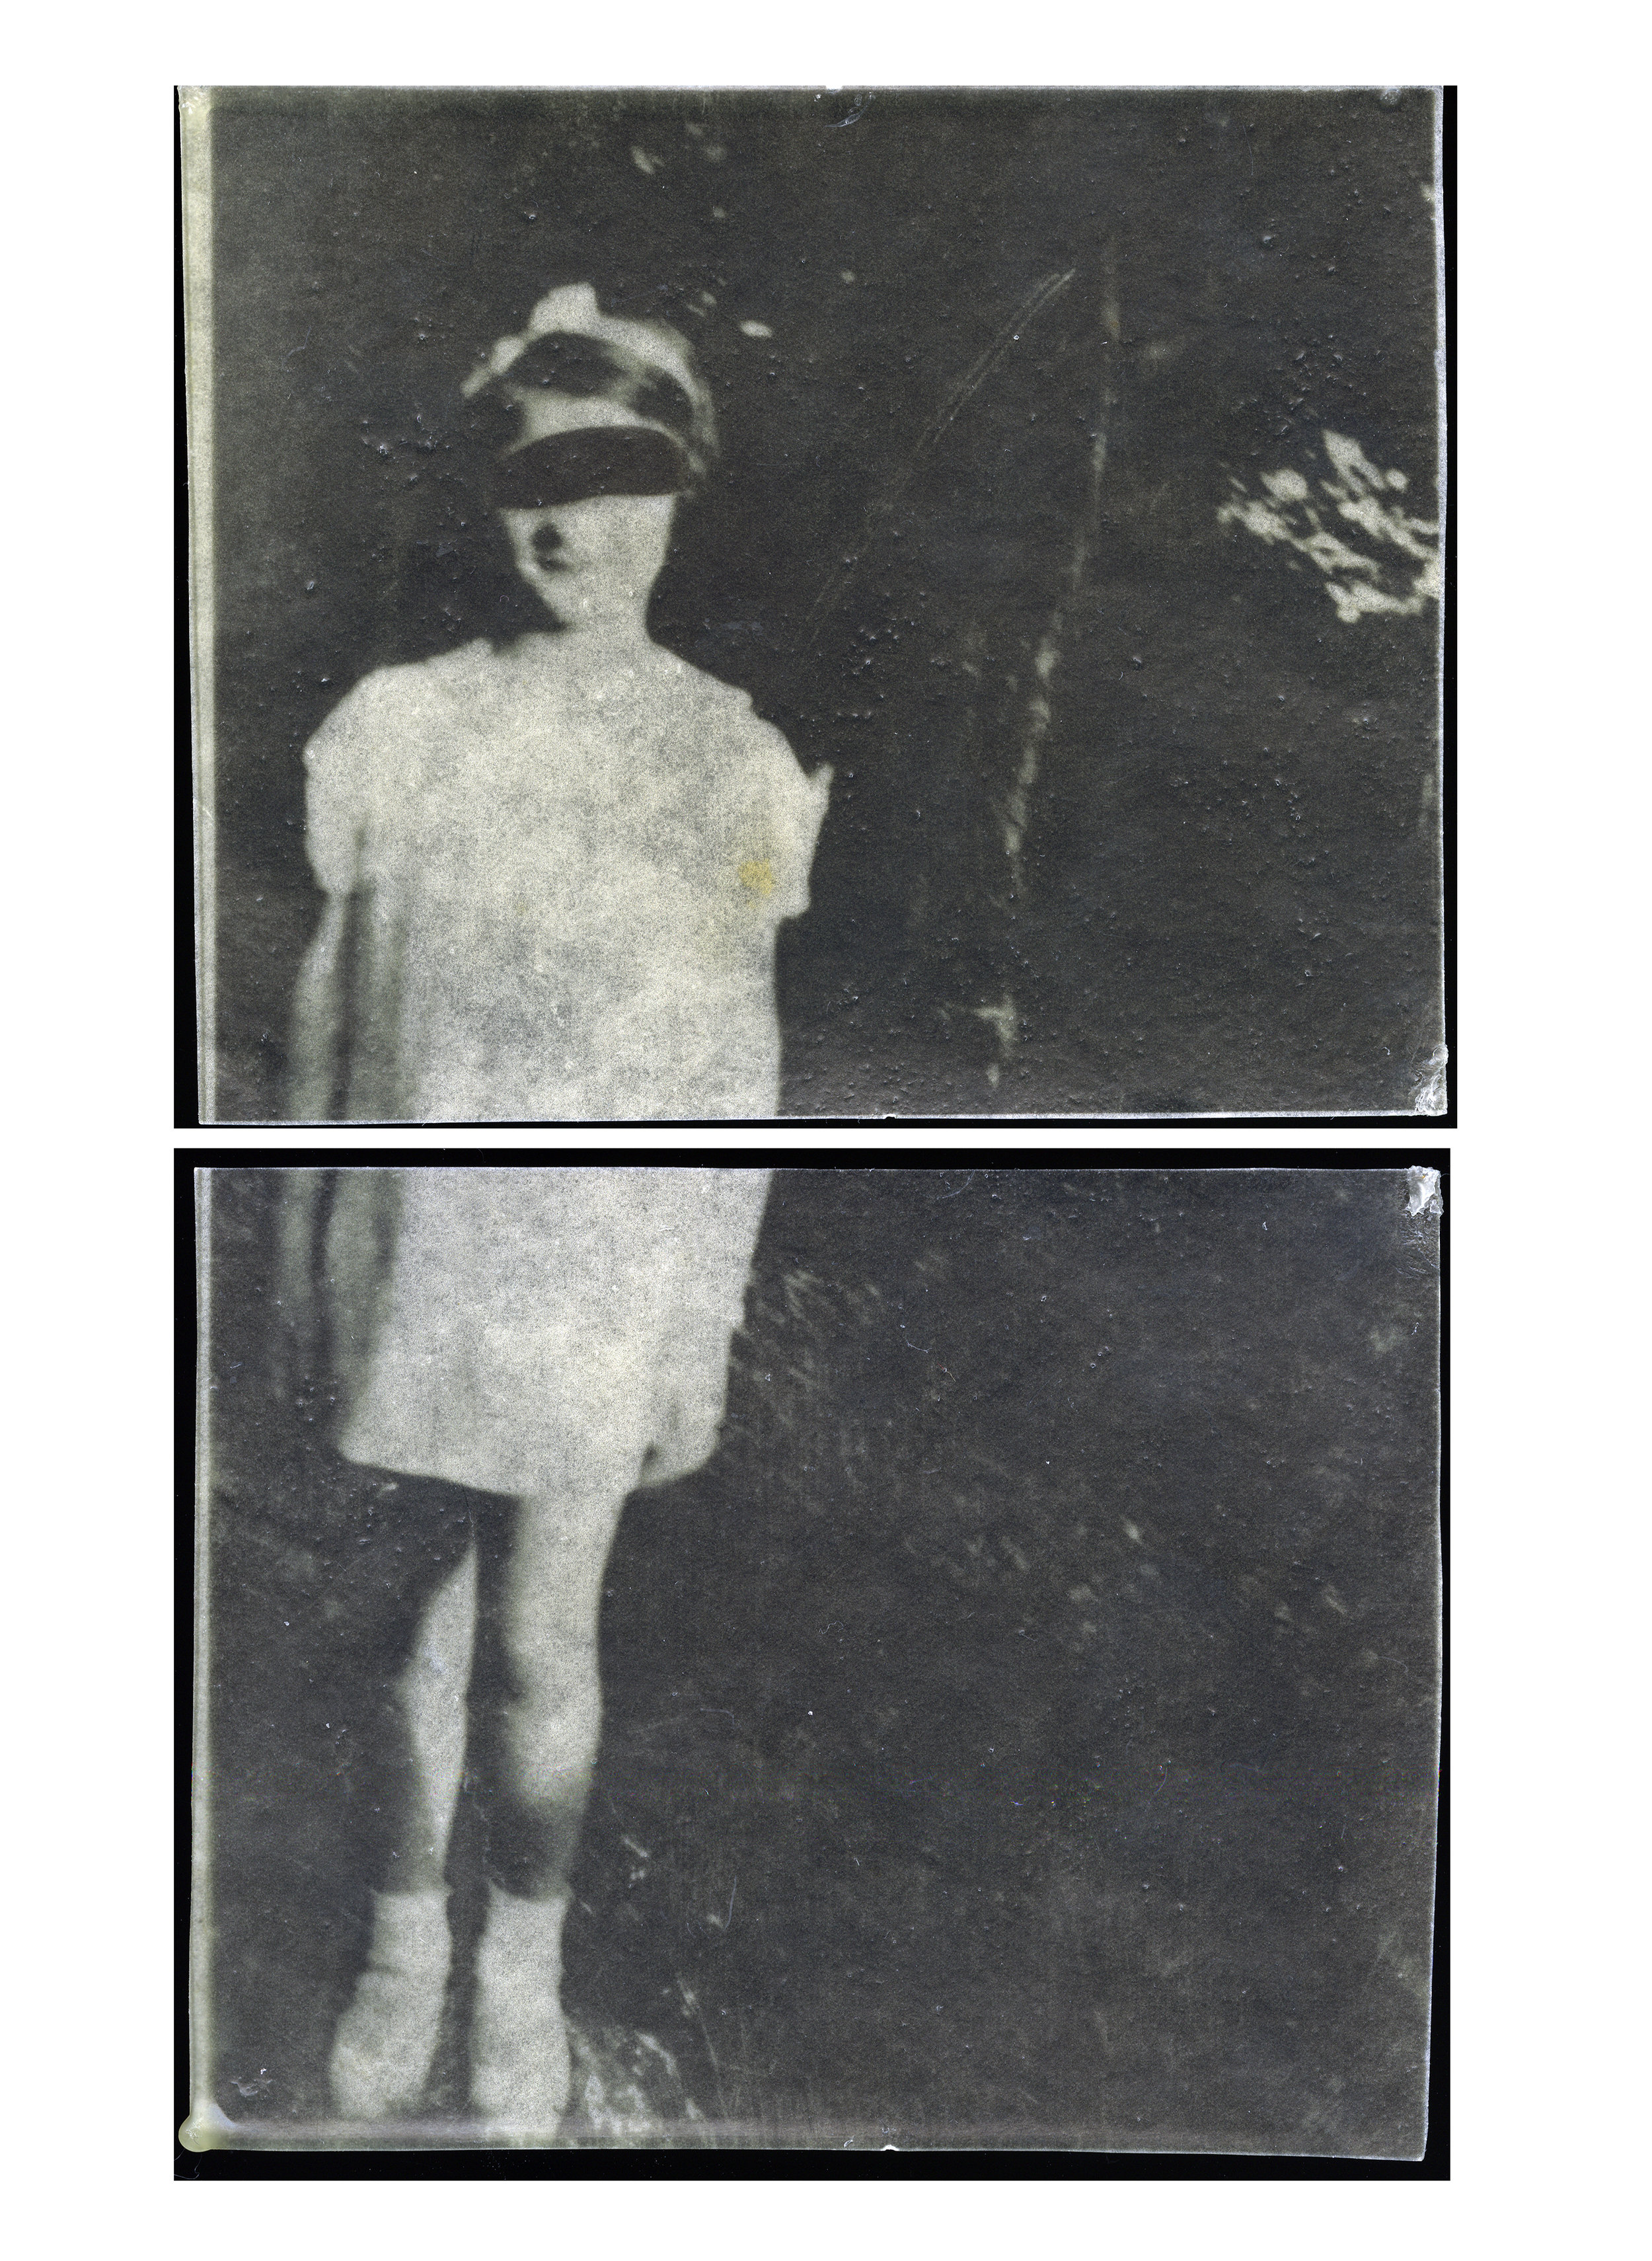 blindfoldoriga.jpg